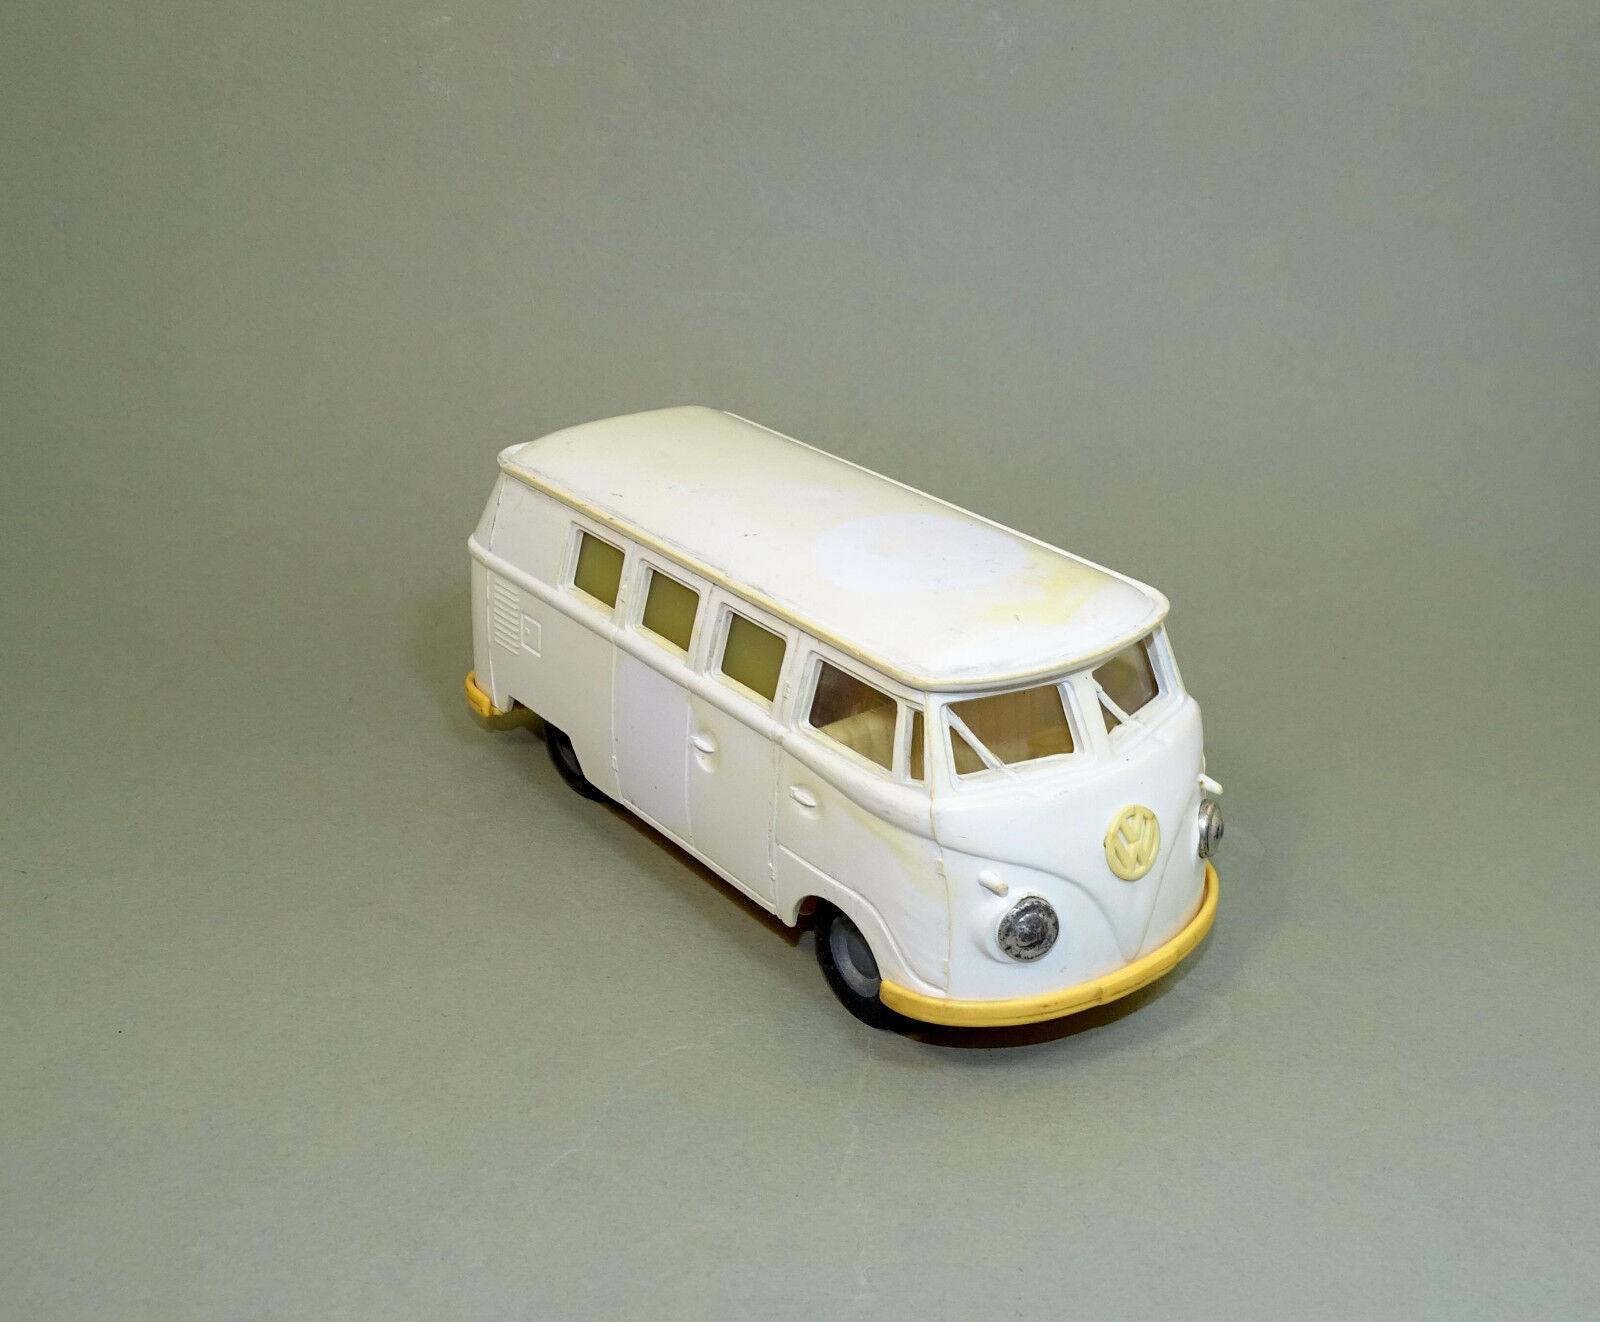 Vintage Ambulance Volkswagen VW T1 Bus Van Toy Car Hungary 1970s